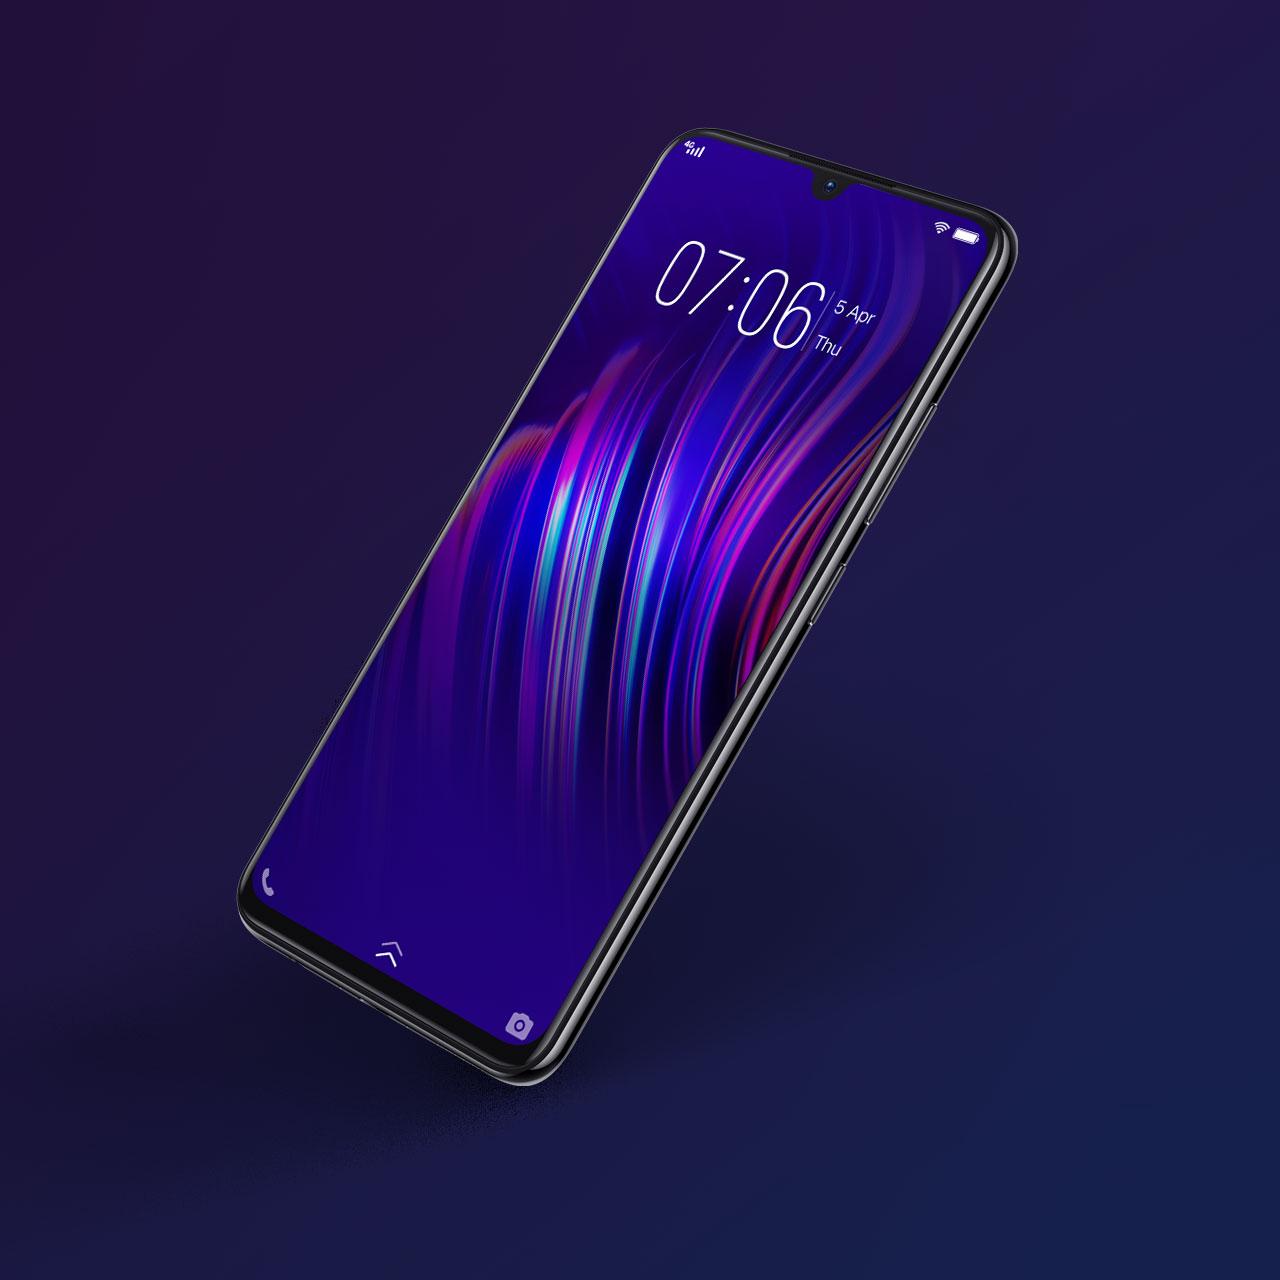 vivo V11 (4GB) - PakMobiZone - Buy Mobile Phones, Tablets, Accessories